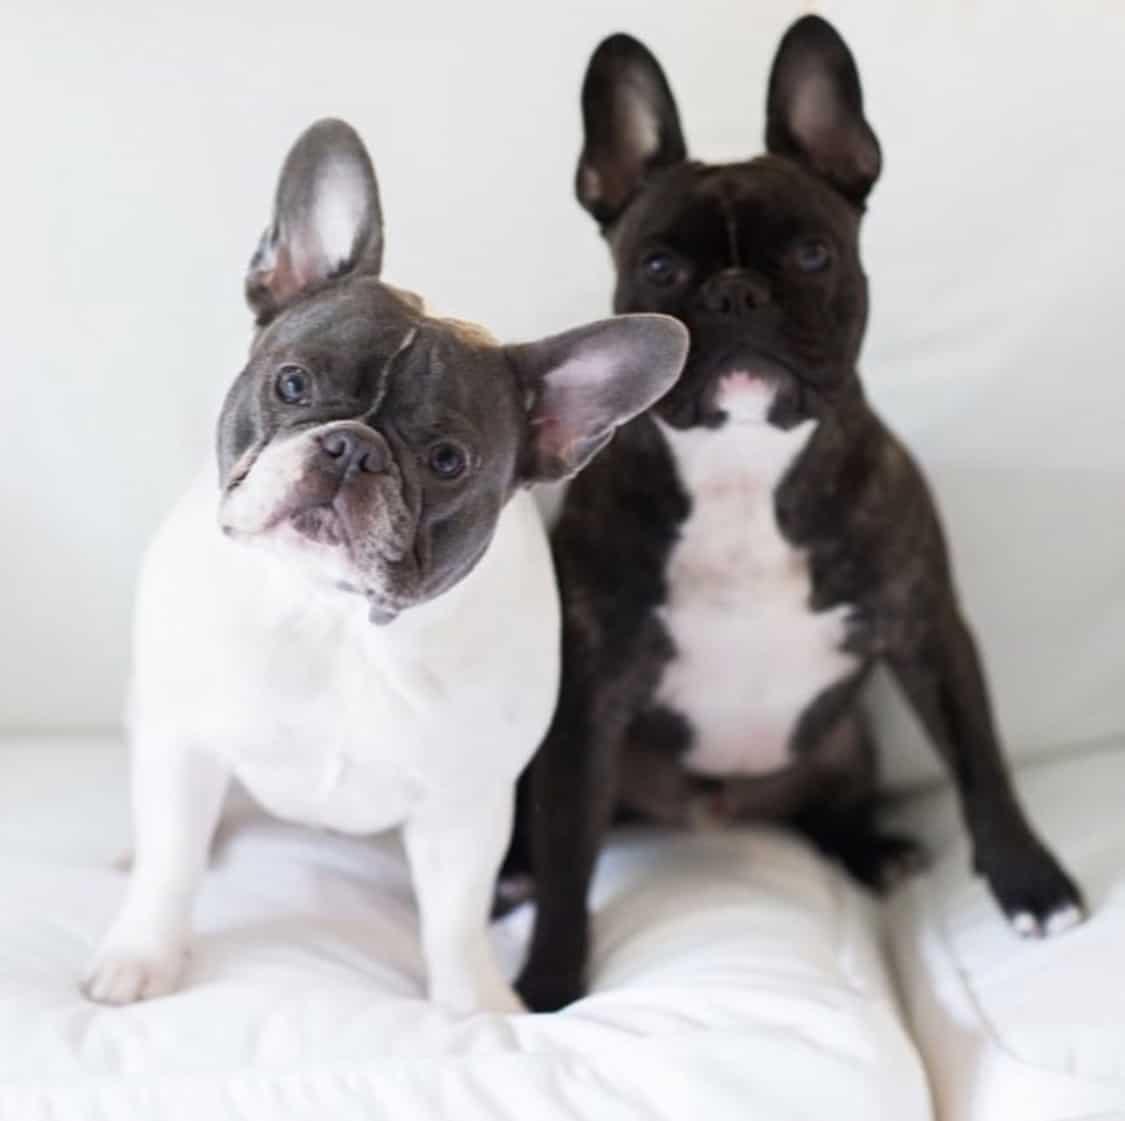 Henry & Marvin